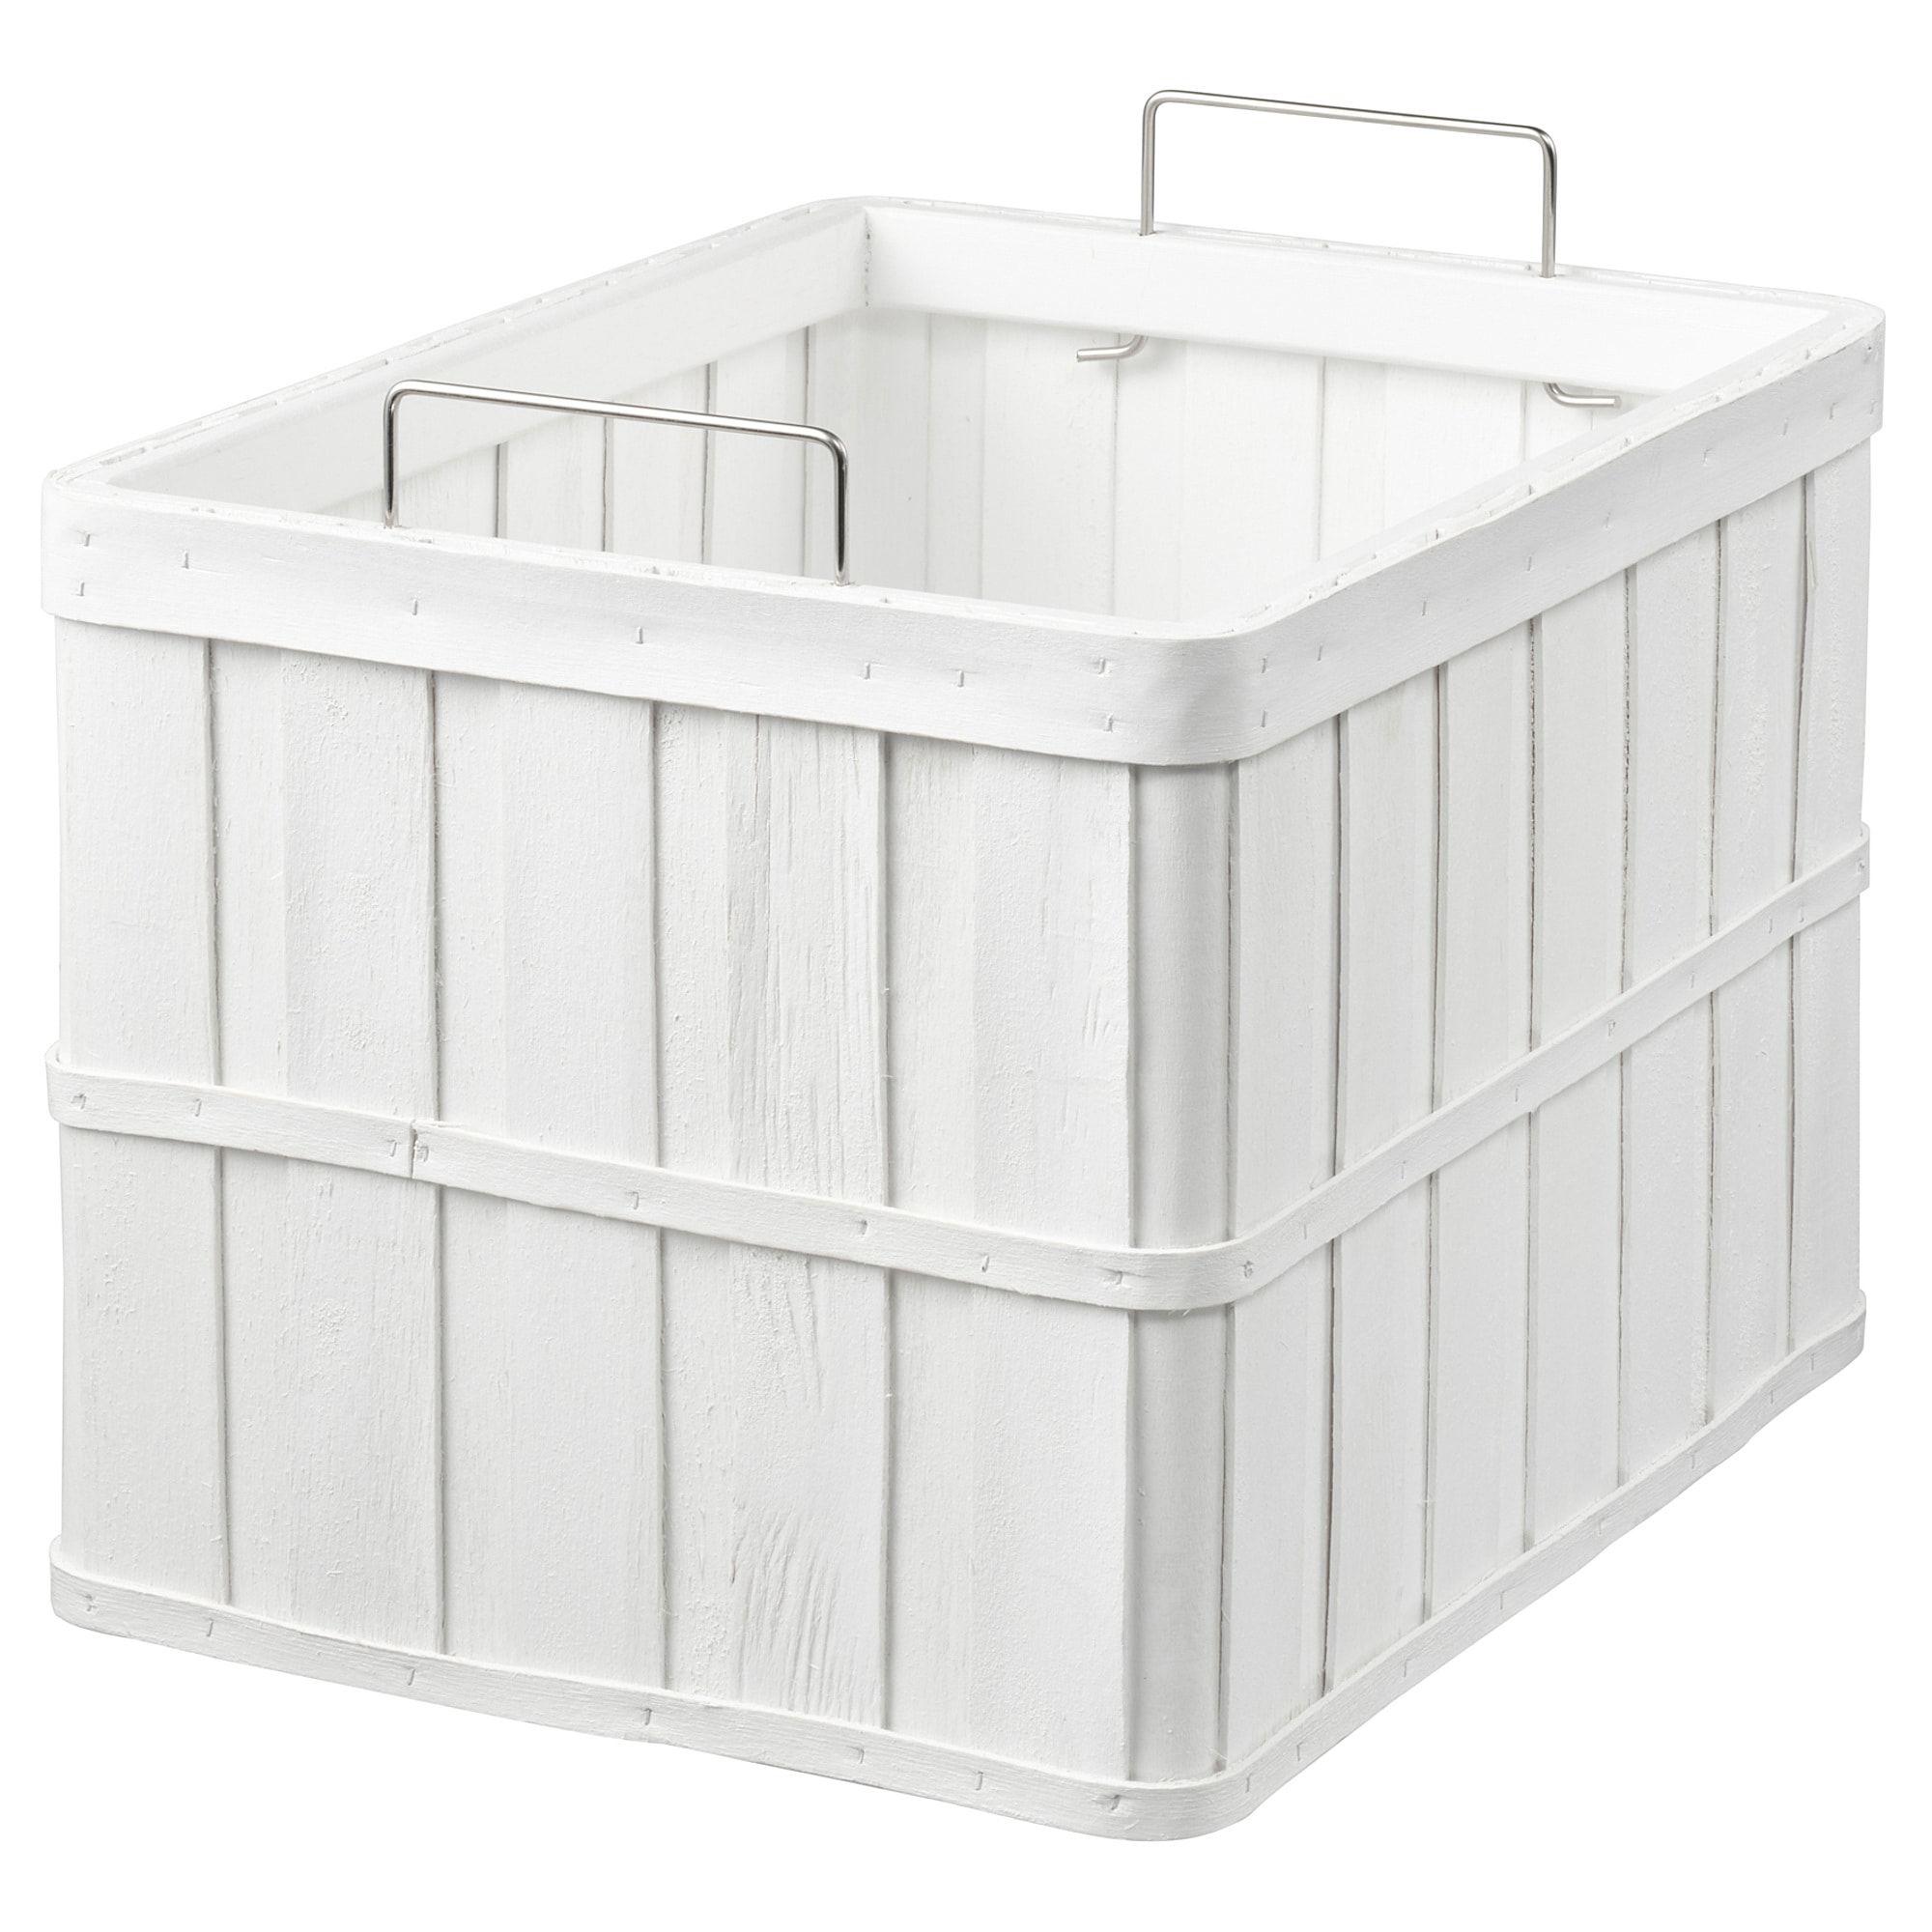 Ikea Brankis White Basket Products In 2019 Ikea Ikea Basket